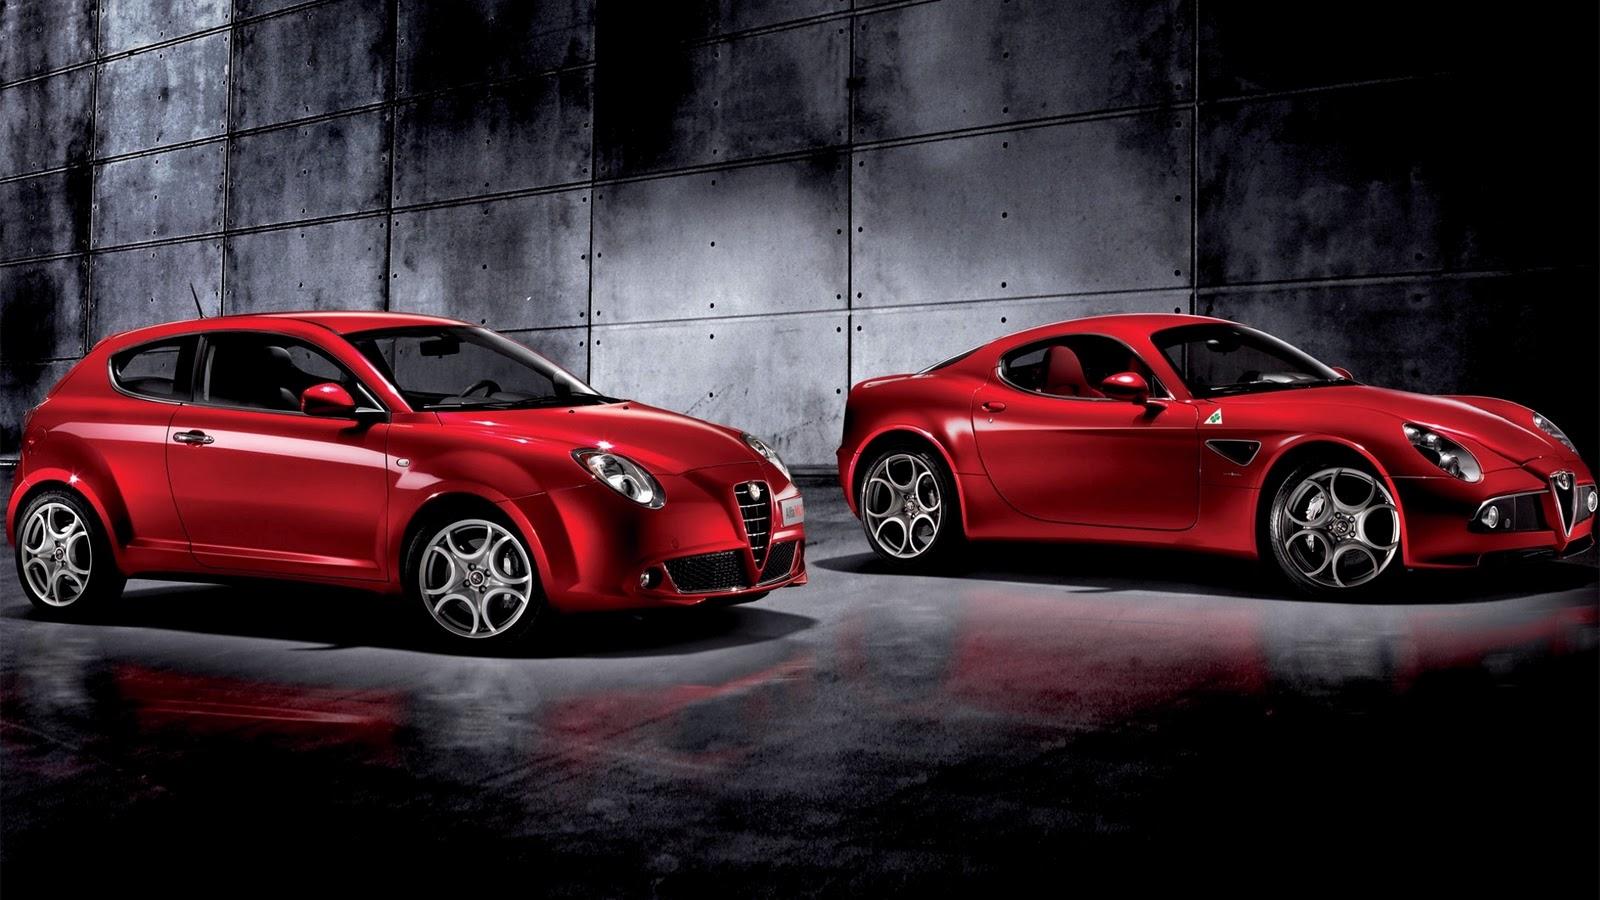 http://2.bp.blogspot.com/-C38jPhLaPOg/TxlC8UC0HaI/AAAAAAAAAH0/4vA9kPoSQNw/s1600/Red+Cars+in+black+background+1080p+www.walls9.blogspot.com.jpg